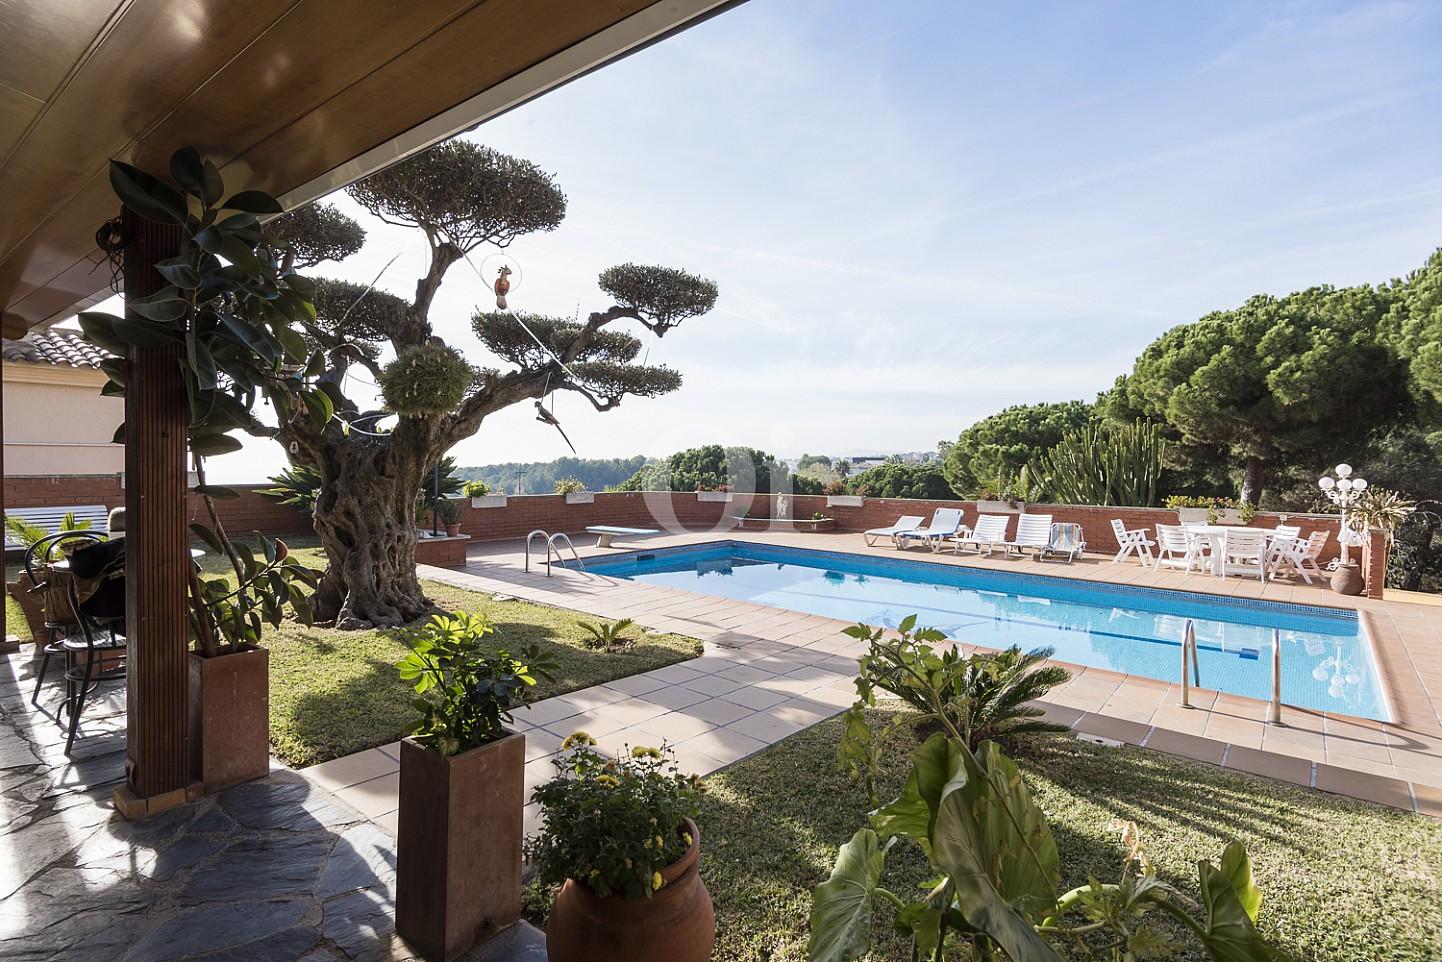 Gran piscina exterior rodeada por un jardín con árboles frutales